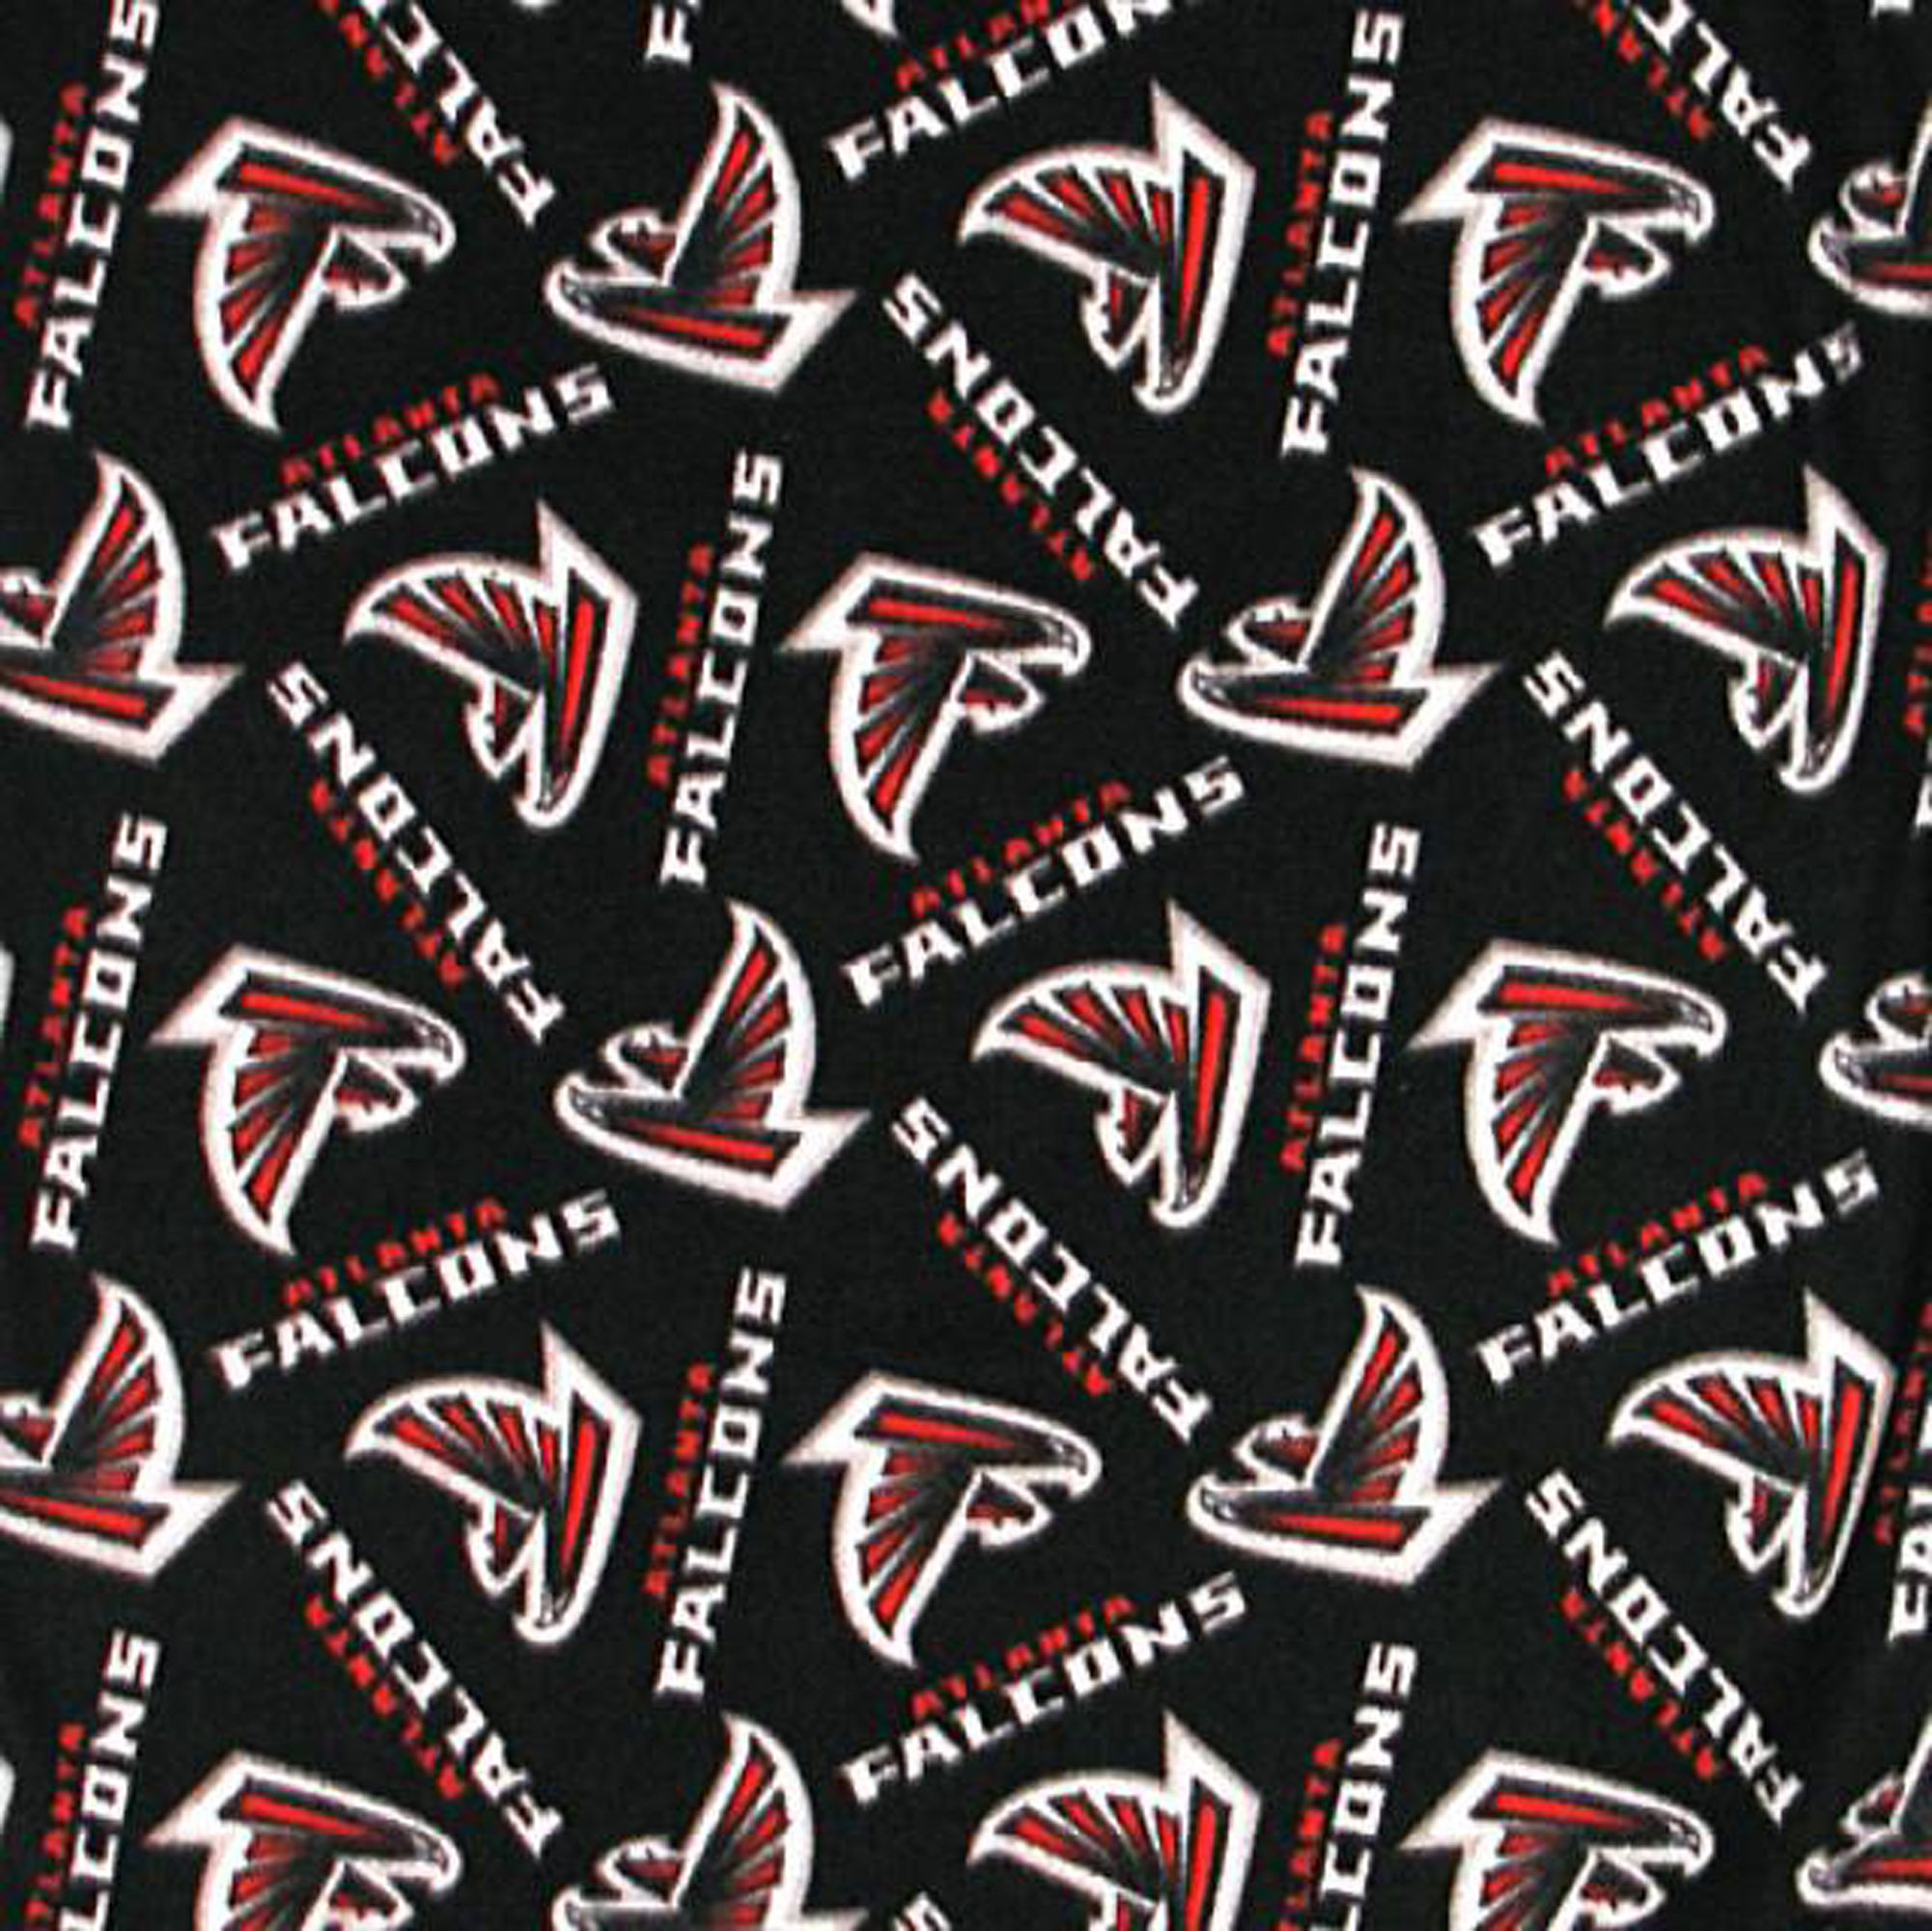 Atlanta Falcons Fleece Fabric Nfl Football Team Fleece Fabric In 2020 Fleece Fabric Football Fabric Sewing Fleece